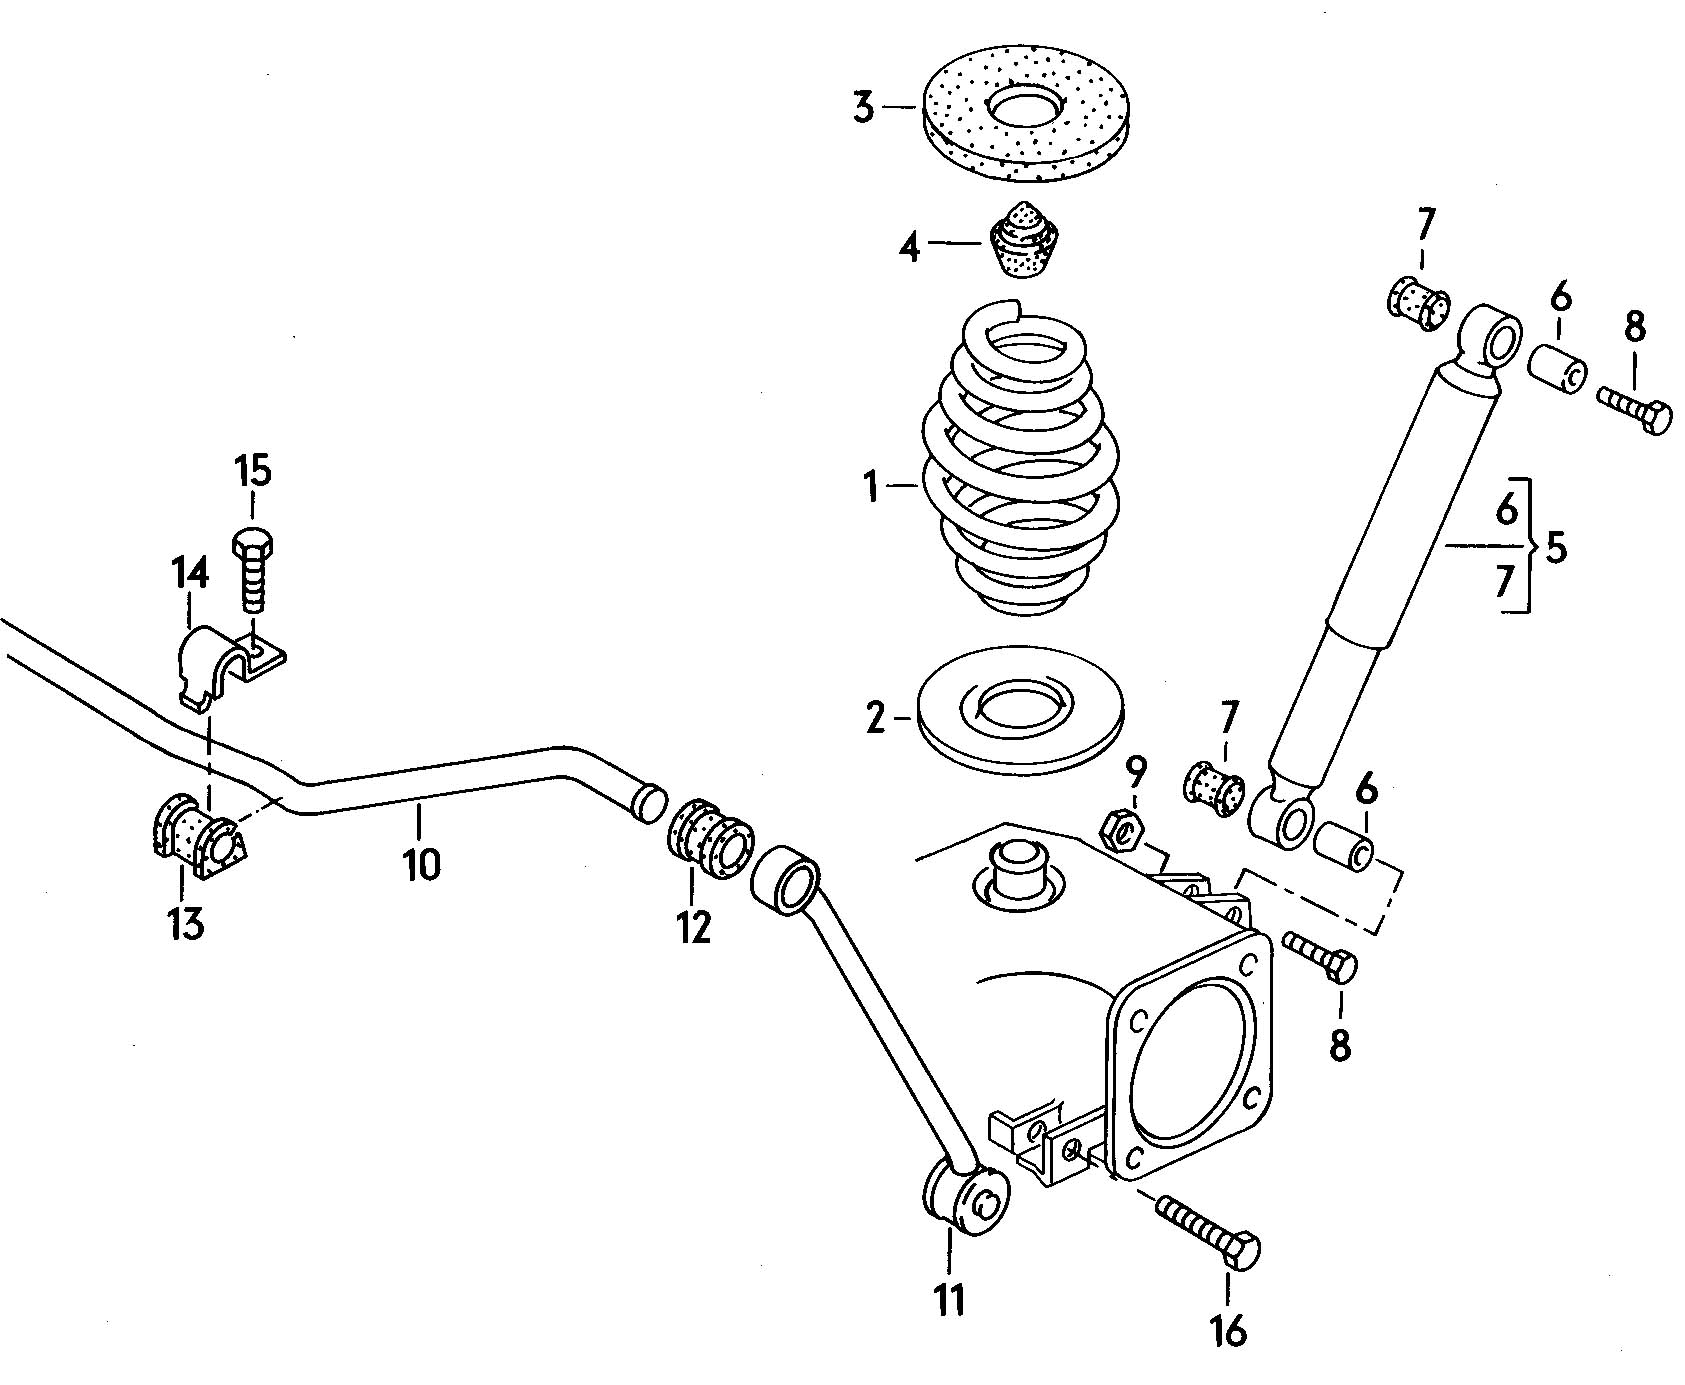 1989 volkswagen cabriolet wiring diagram volkswagen auto